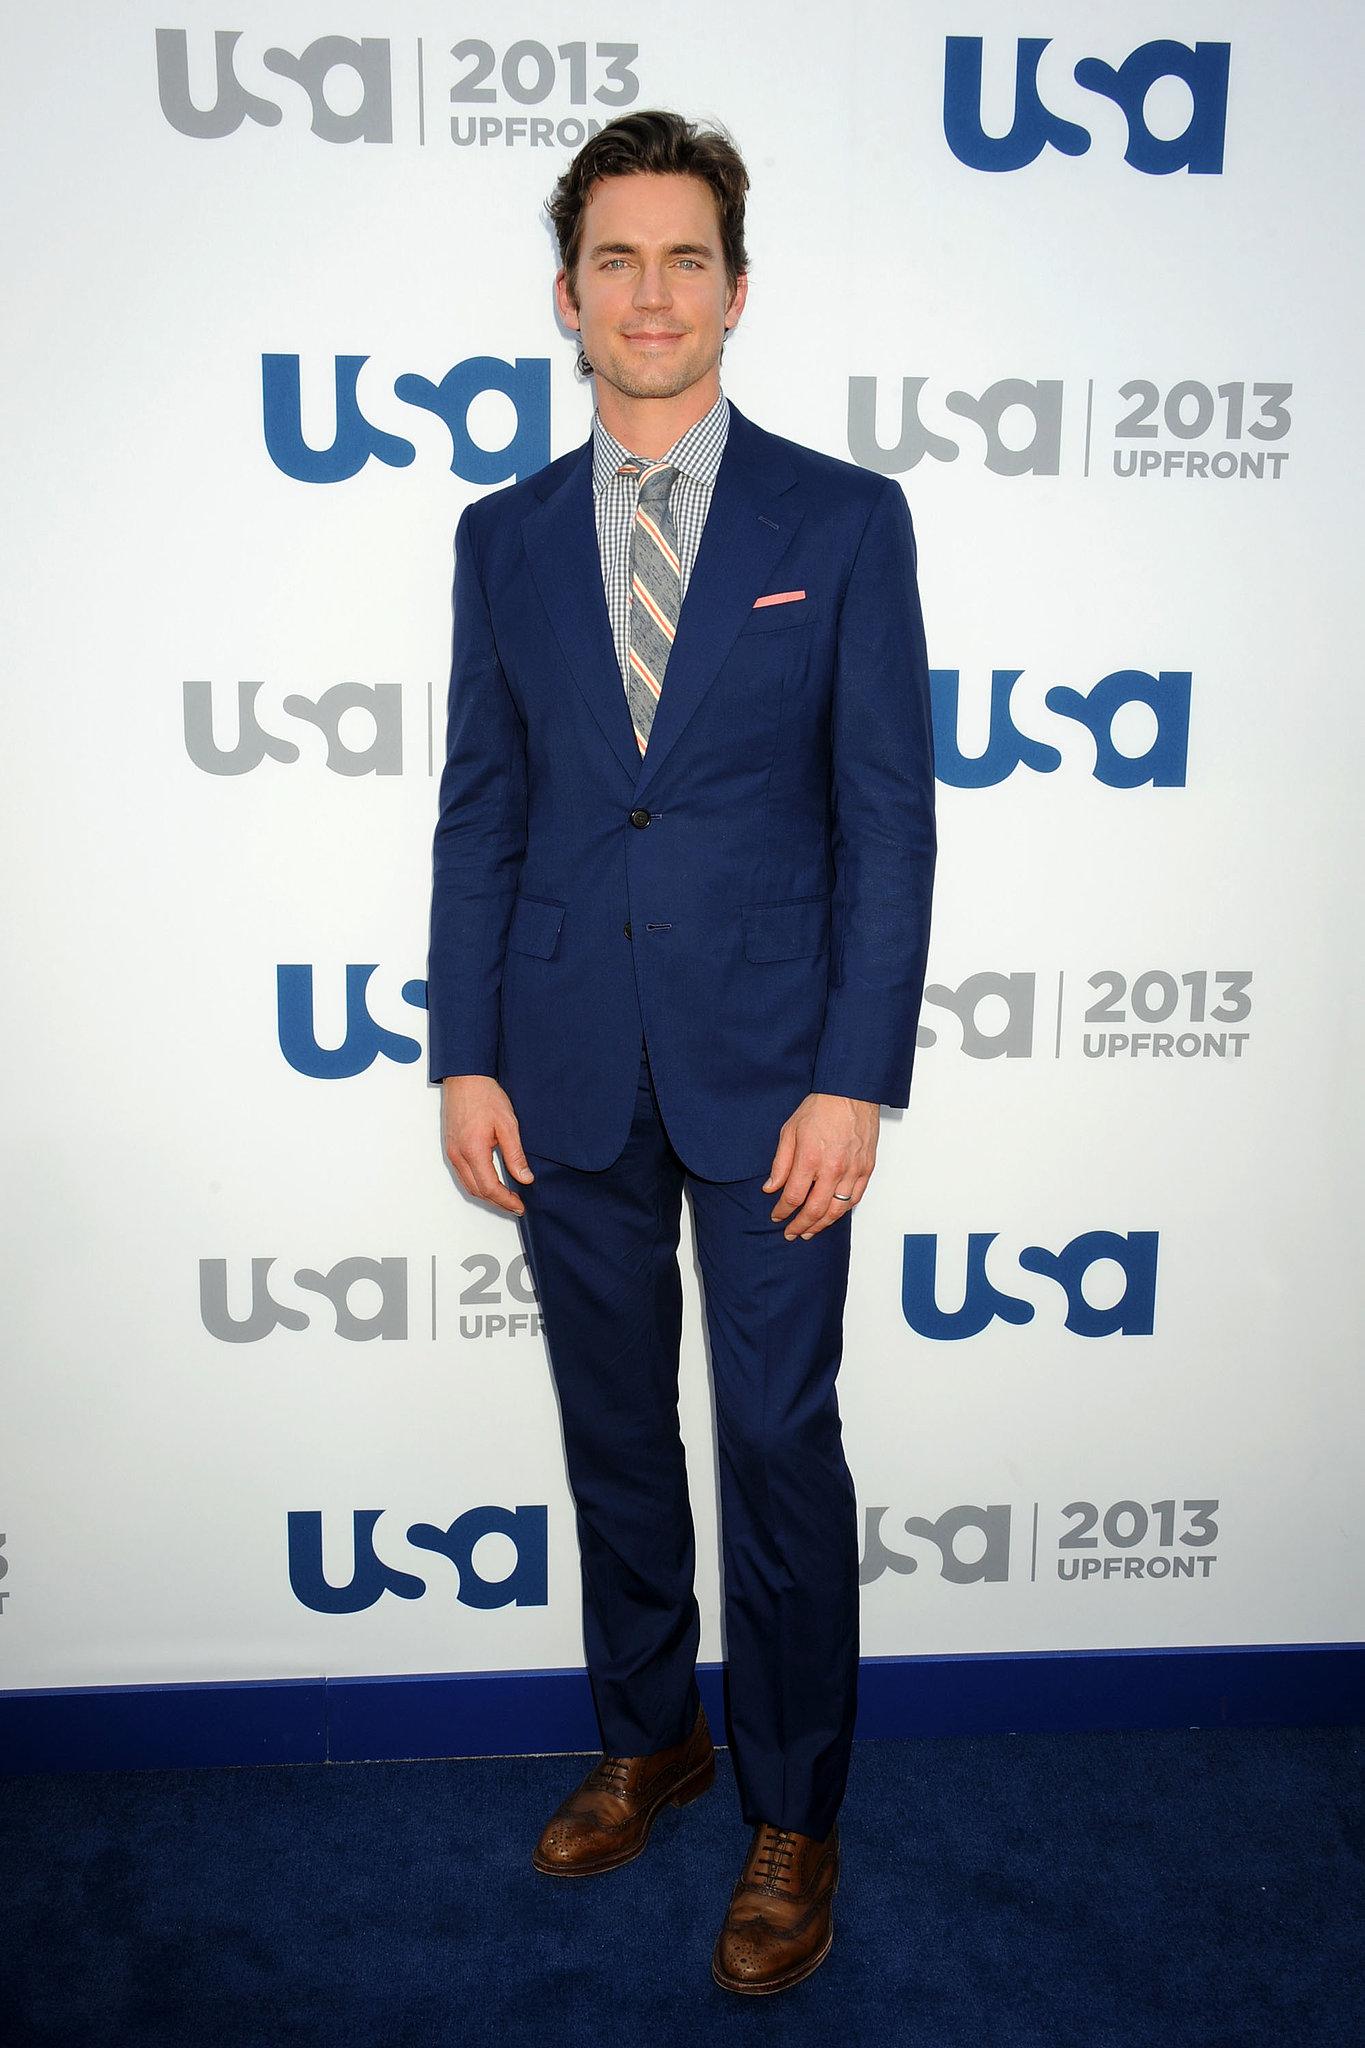 Matt Bomer looked great in a blue suit.